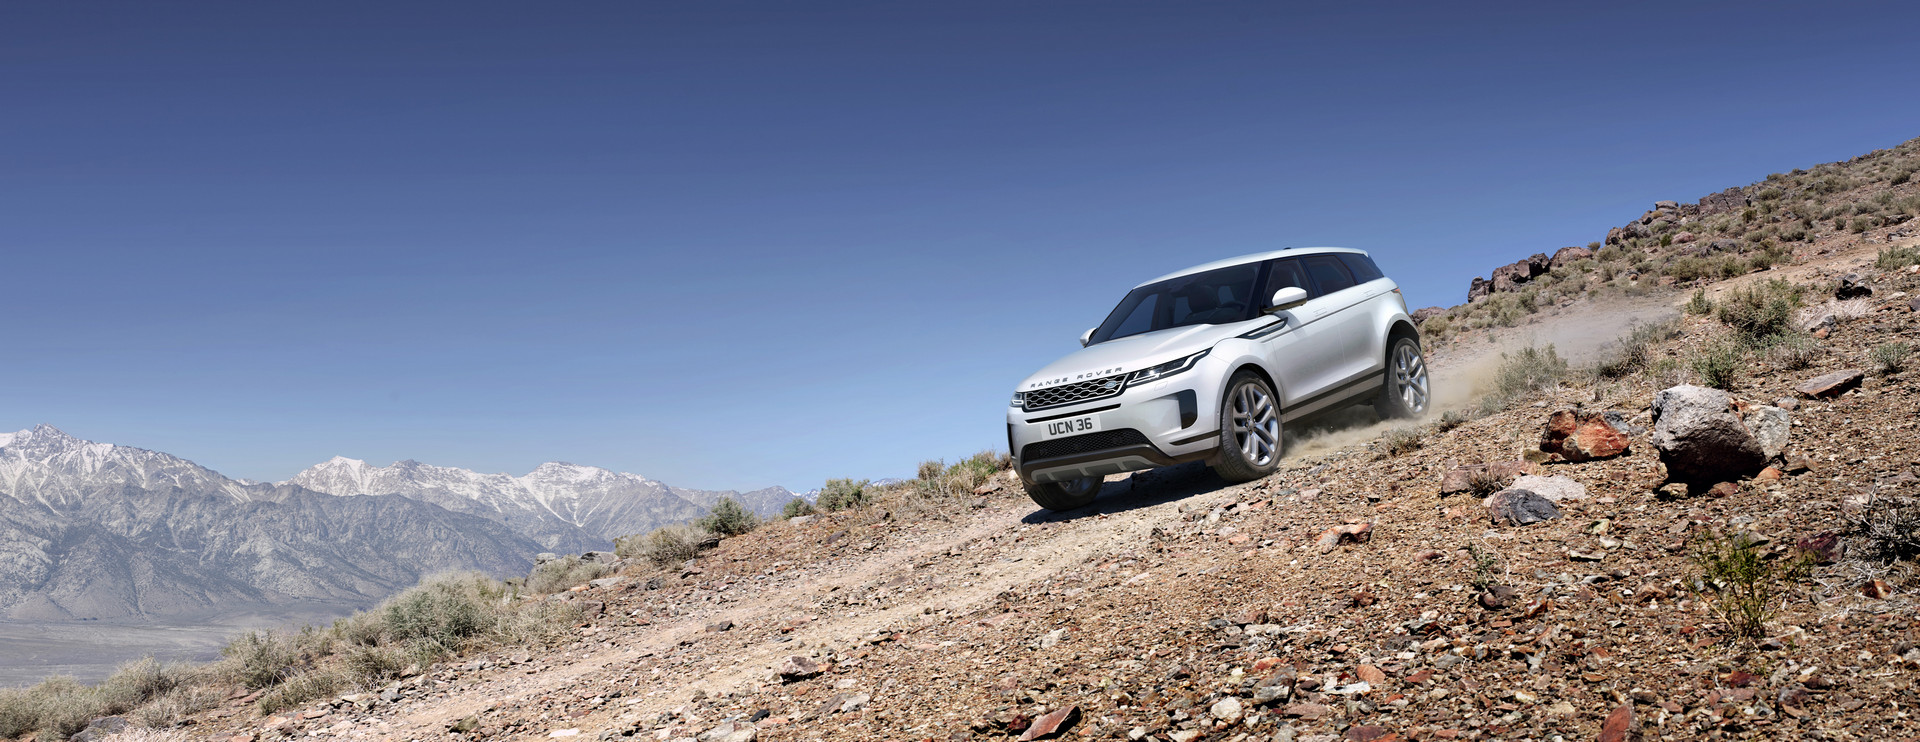 2019 Range Rover Evoque Off-road